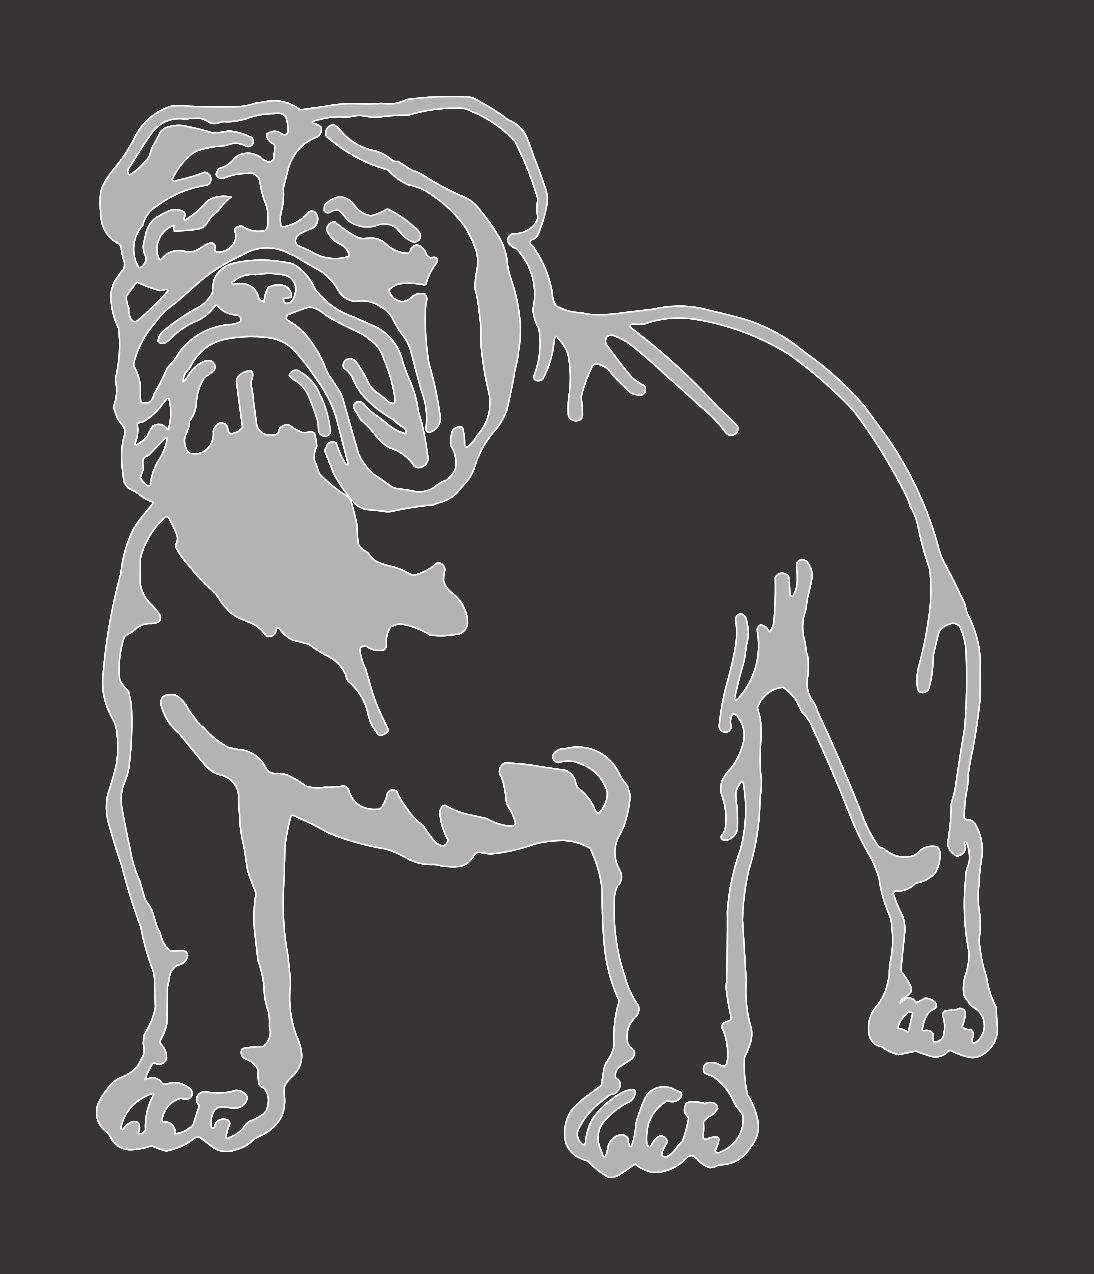 Silver Gray Metallic Bulldog - Die Cut Vinyl Window Decal/Sticker for Car/Truck Barking Sand Designs 69-495